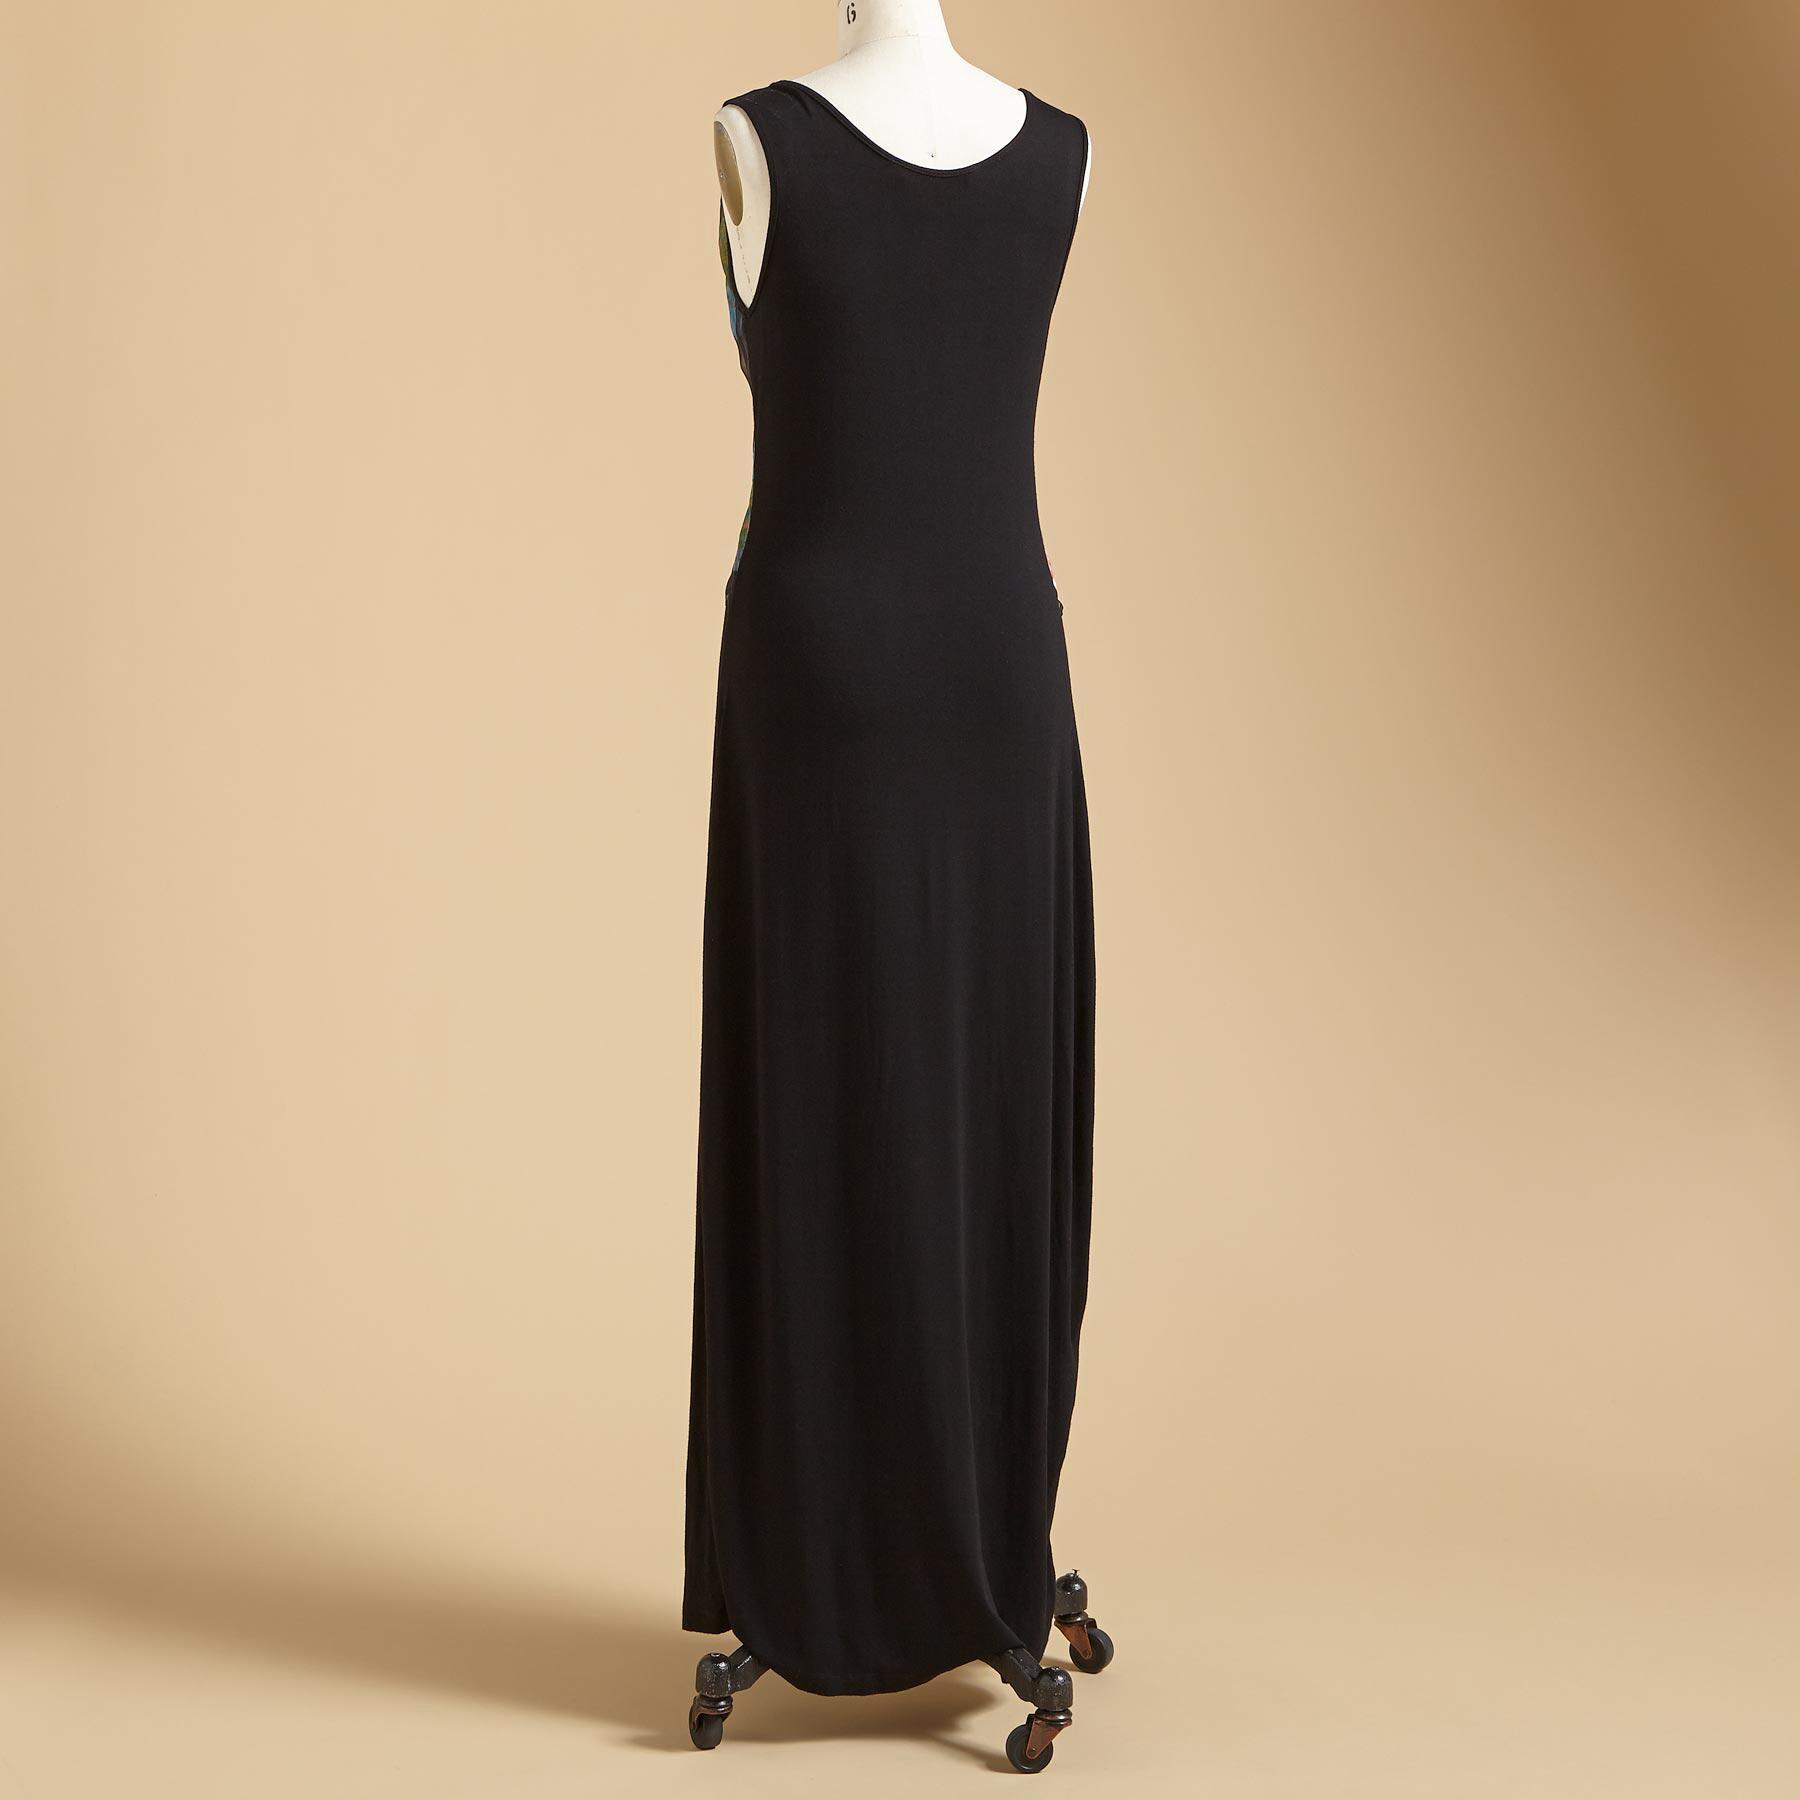 WRAP & TIE TANK DRESS: View 2